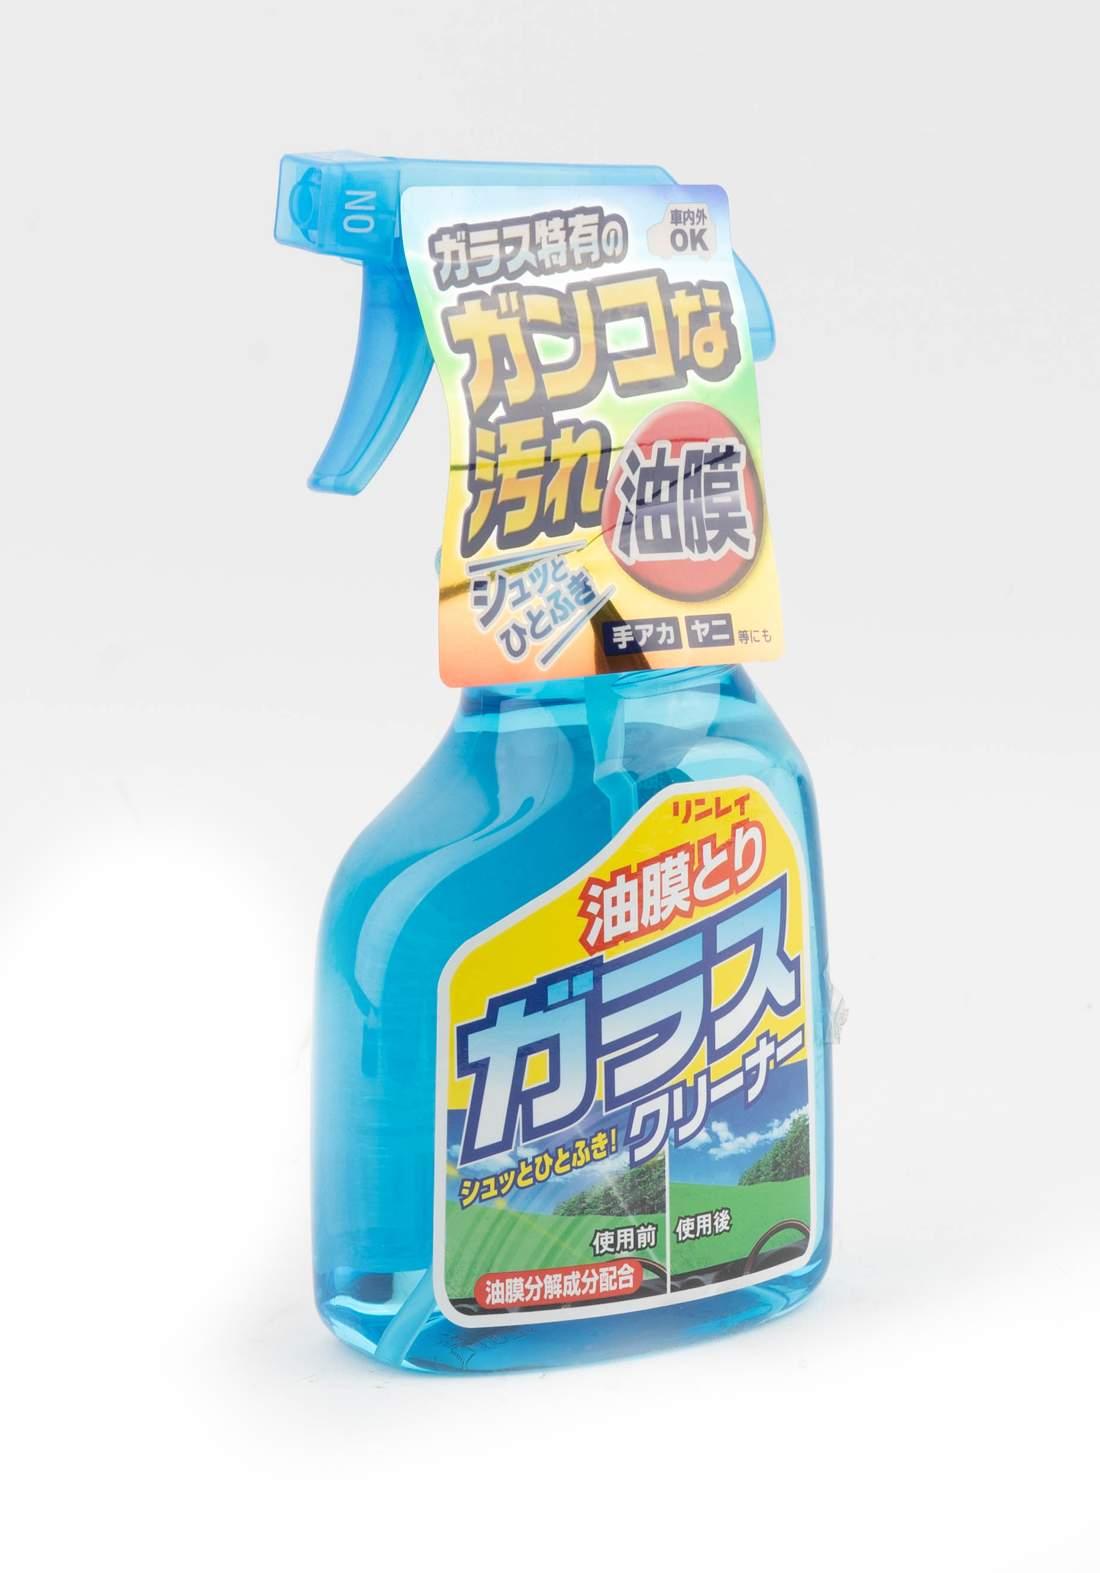 Rinrei 790019 Oil Slick Glass Cleaner 390 ml ملمع زجاج السيارة